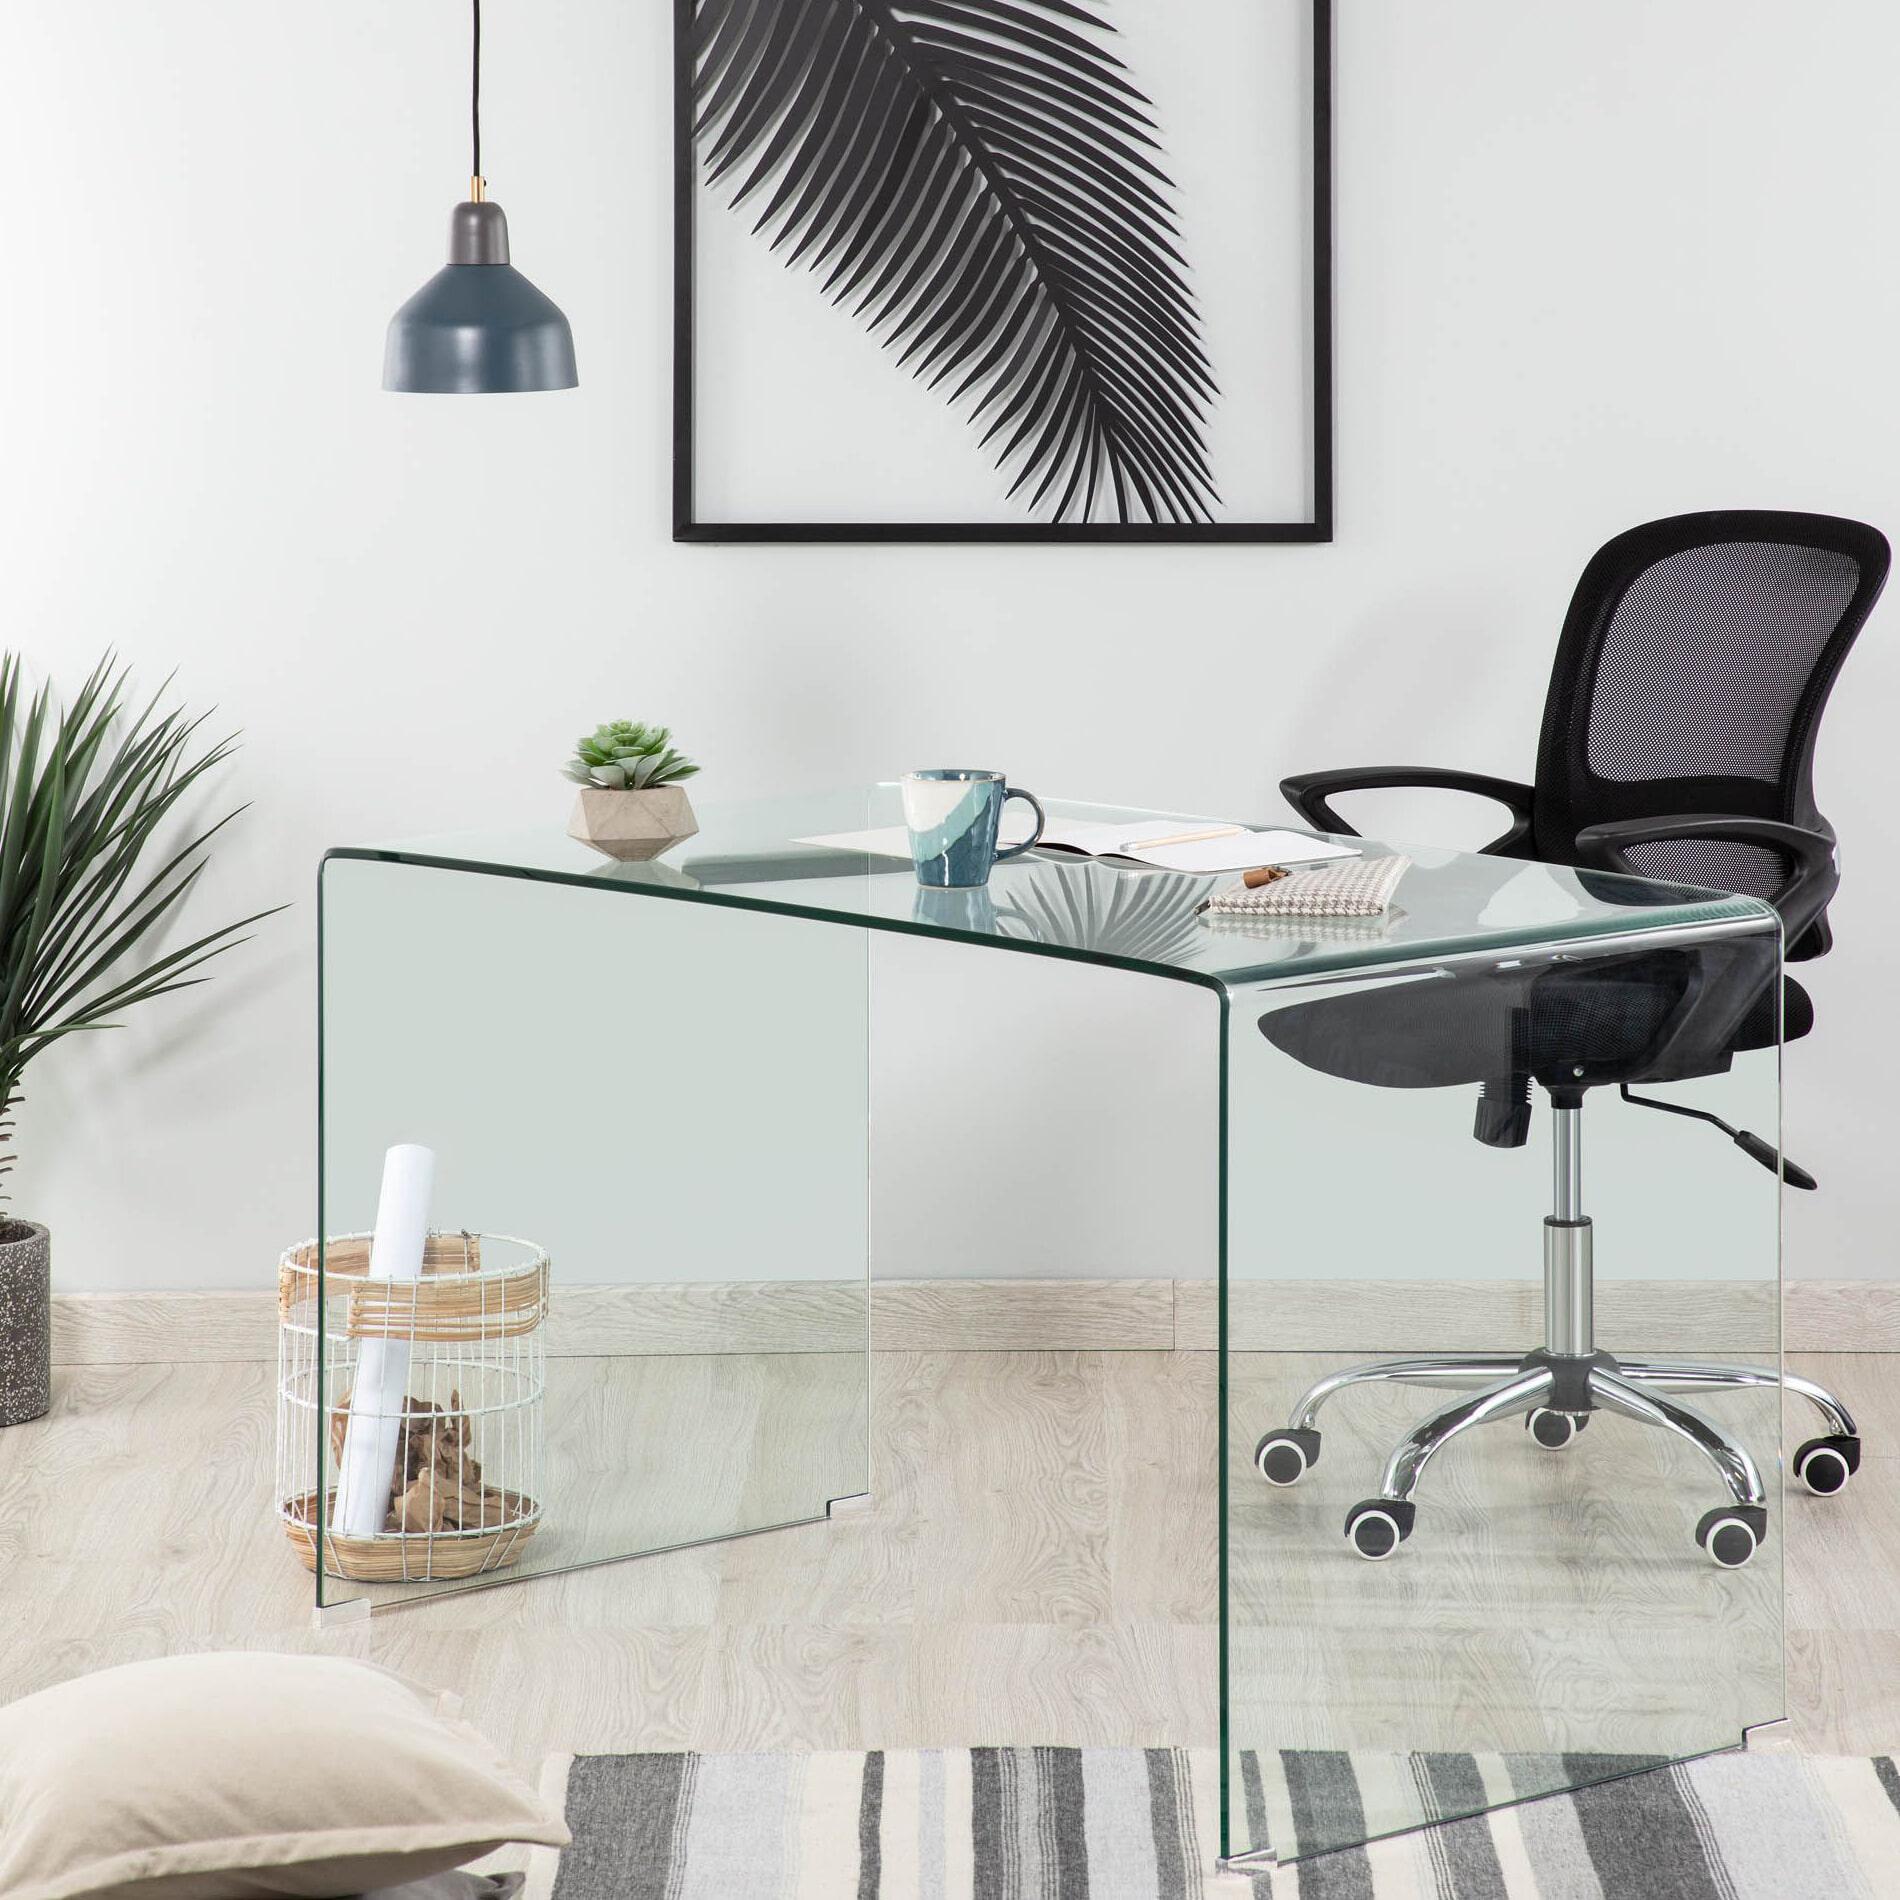 Kave Home Glazen Bureau 'Burano', 125 x 70 cm